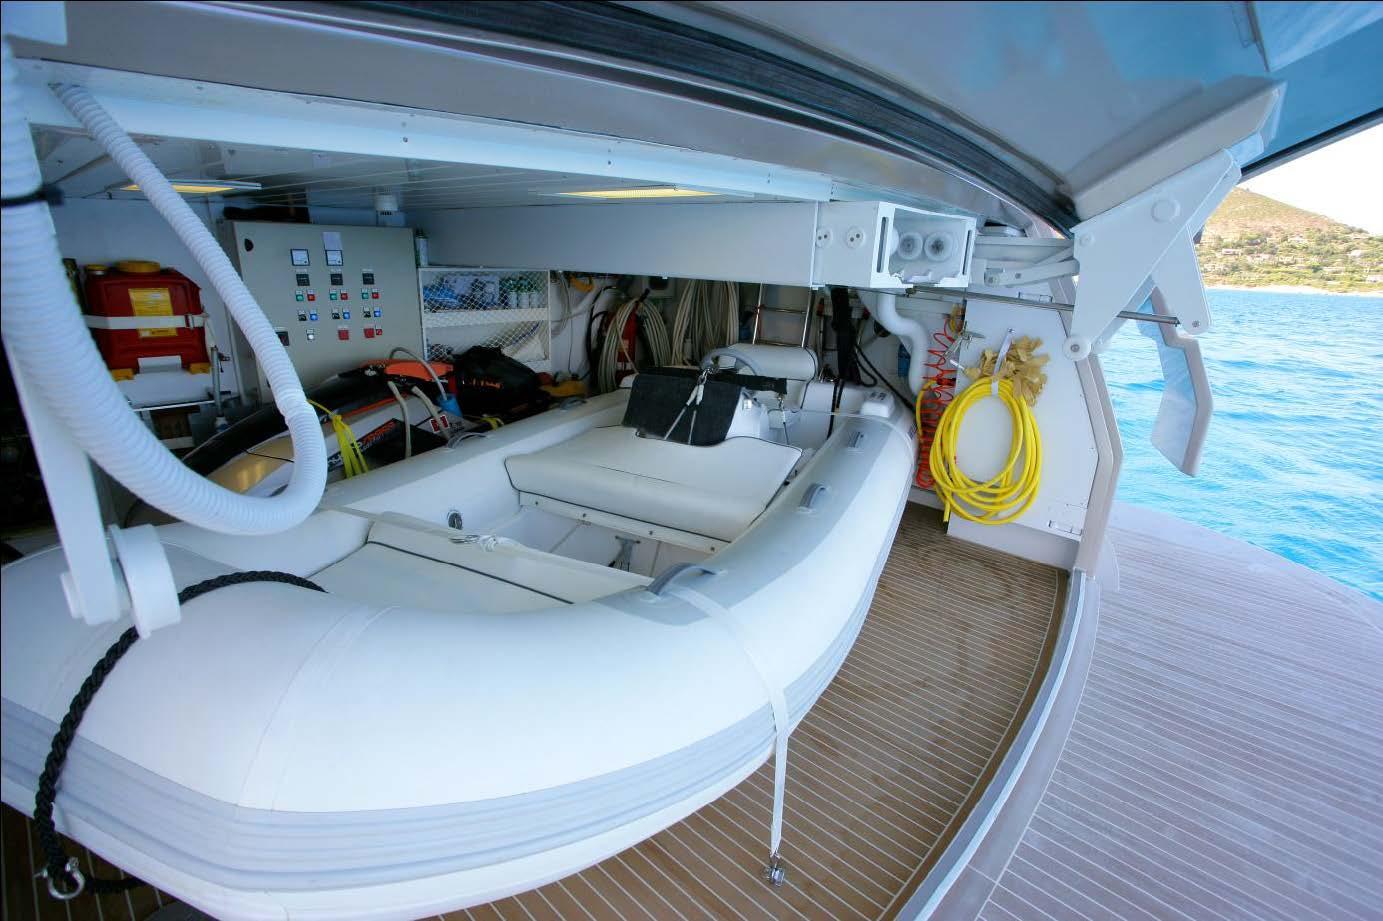 Tender Image Gallery - Triple 888 Eight With Tender - Yacht Tatiana